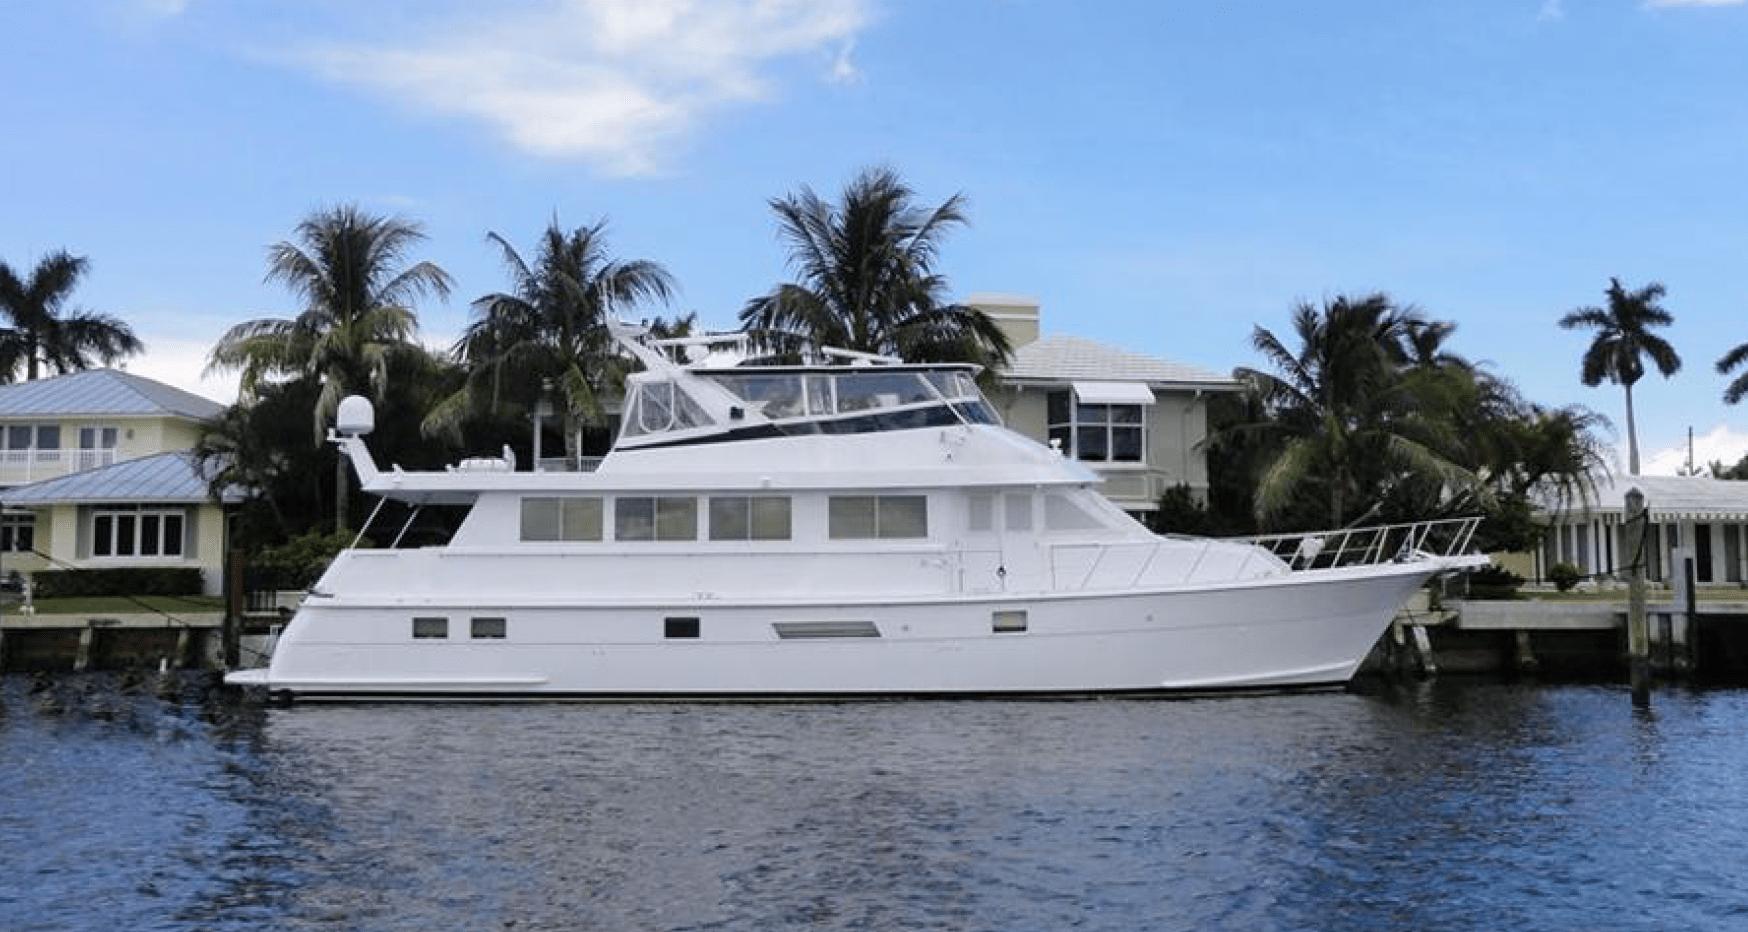 A Wynsong docked near a house